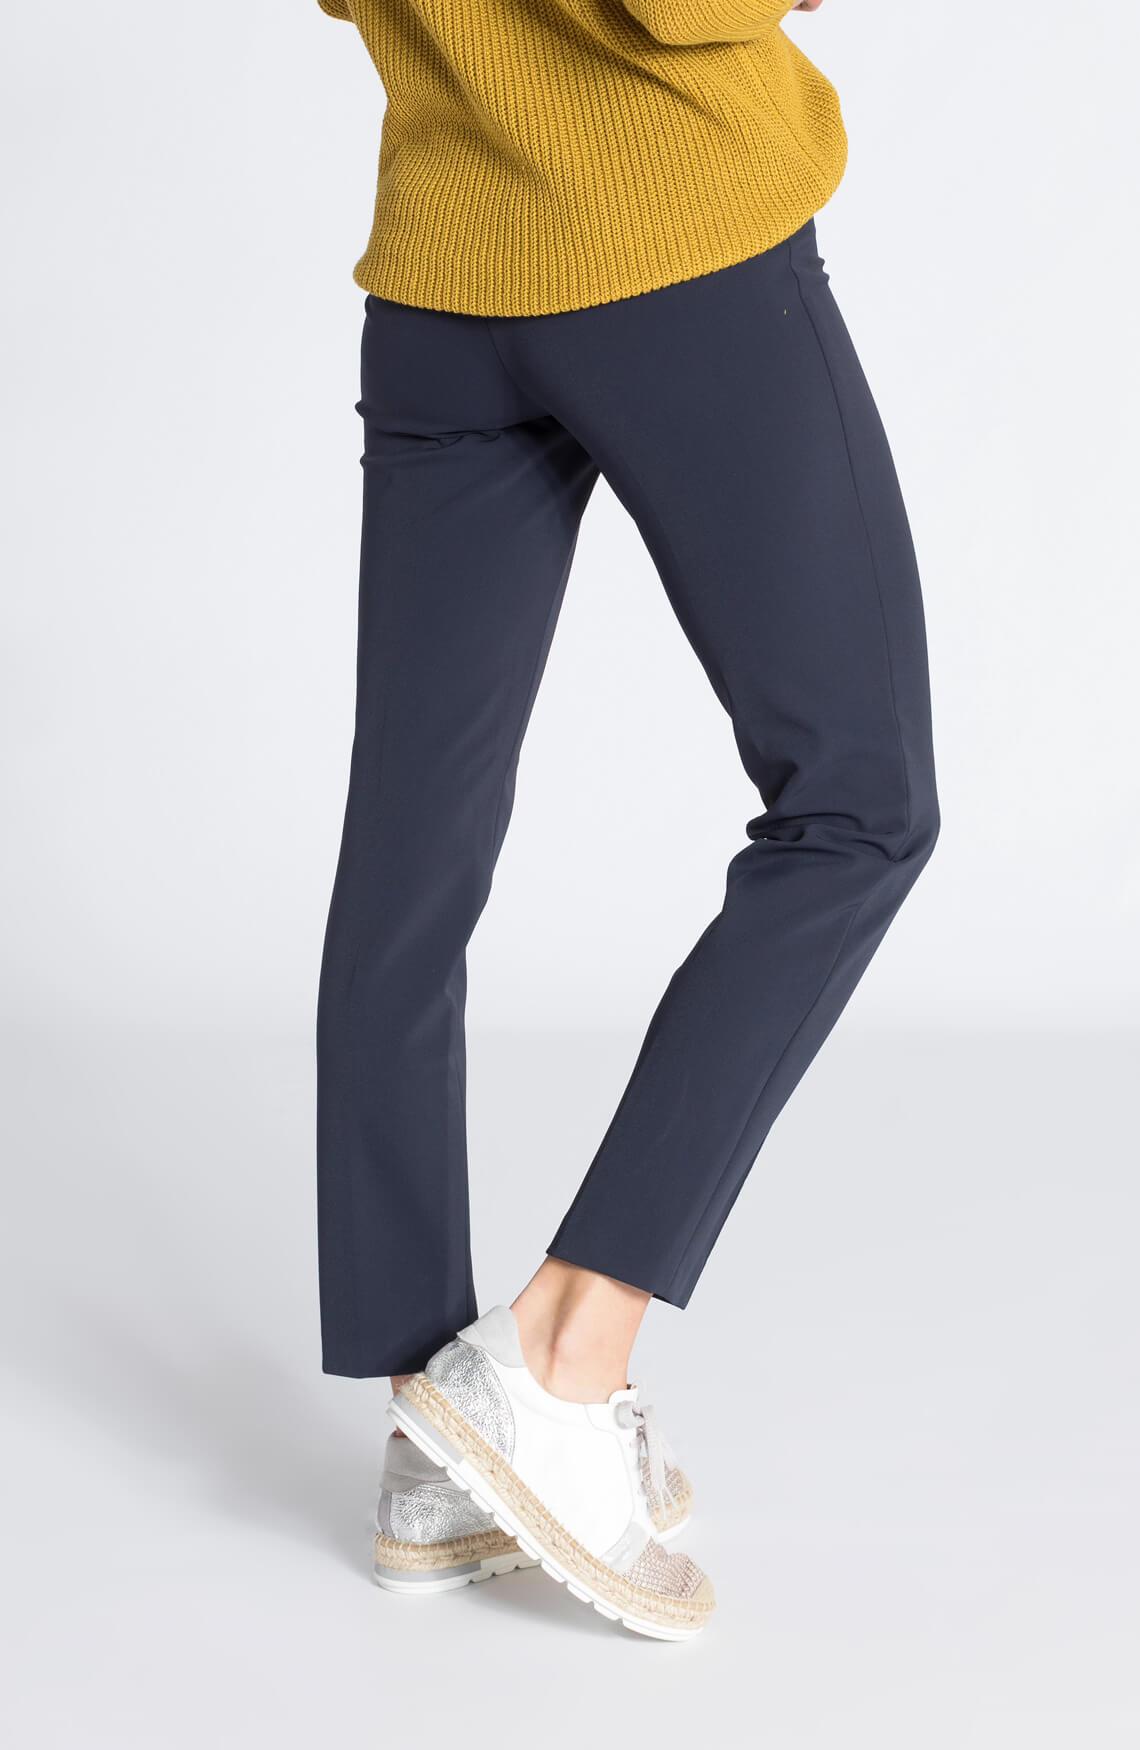 Cambio Dames Ros pantalon marine Blauw